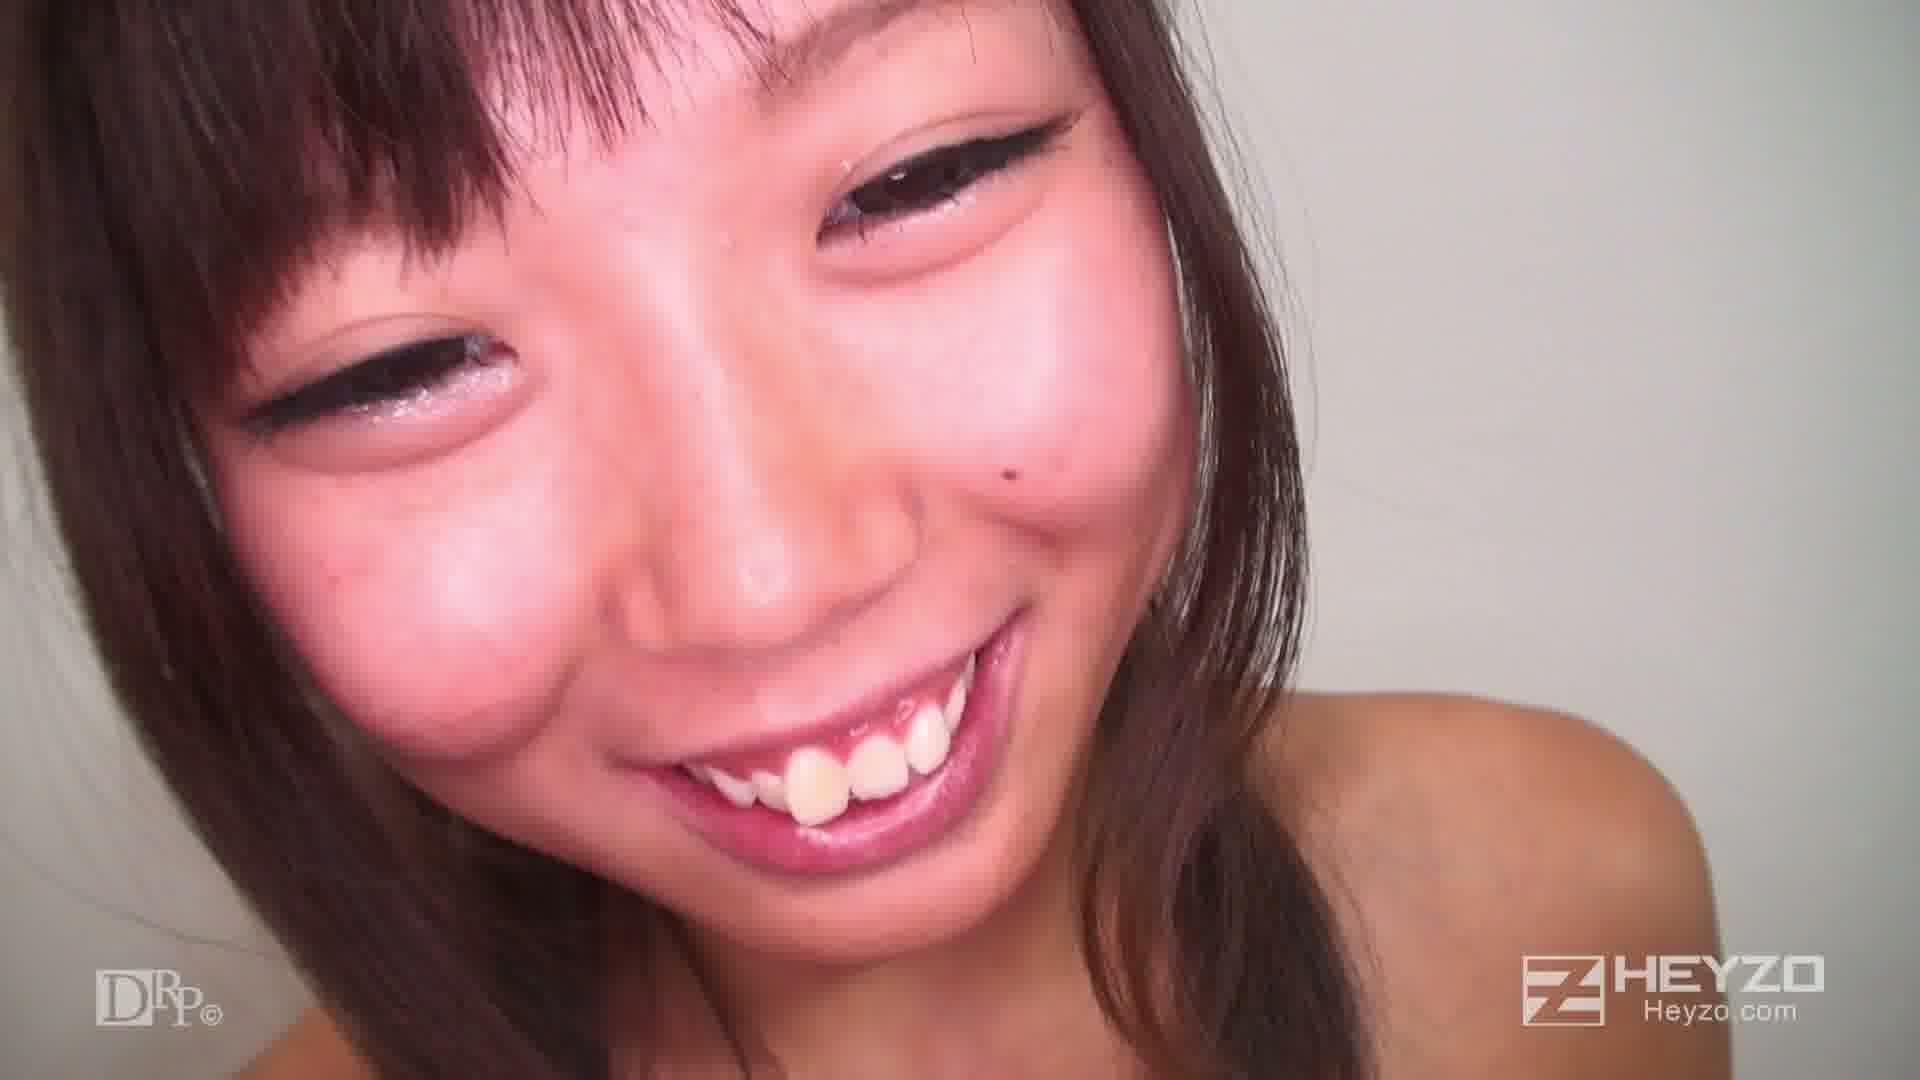 HAMEZO~ハメ撮りコレクション~vol.36 - 若宮みさこ【フェラ パイズリ 正常位 対面座位 机上位 騎乗後背位 バック 中出し】